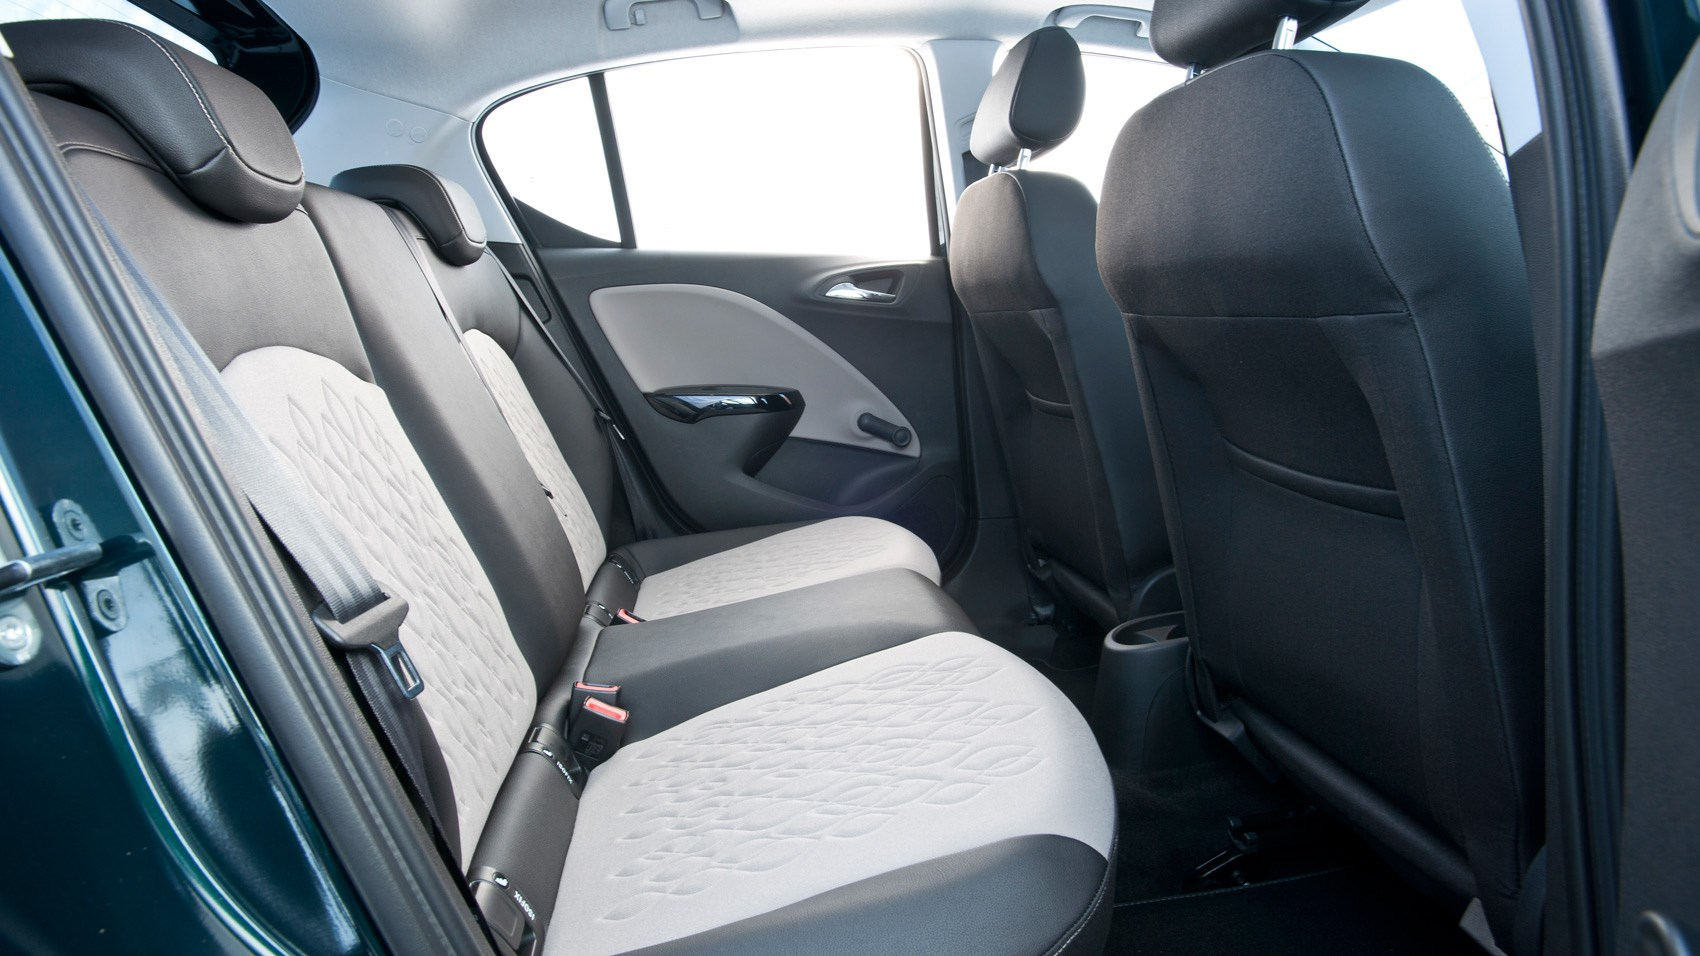 Vauxhall Corsa diesel rear seats